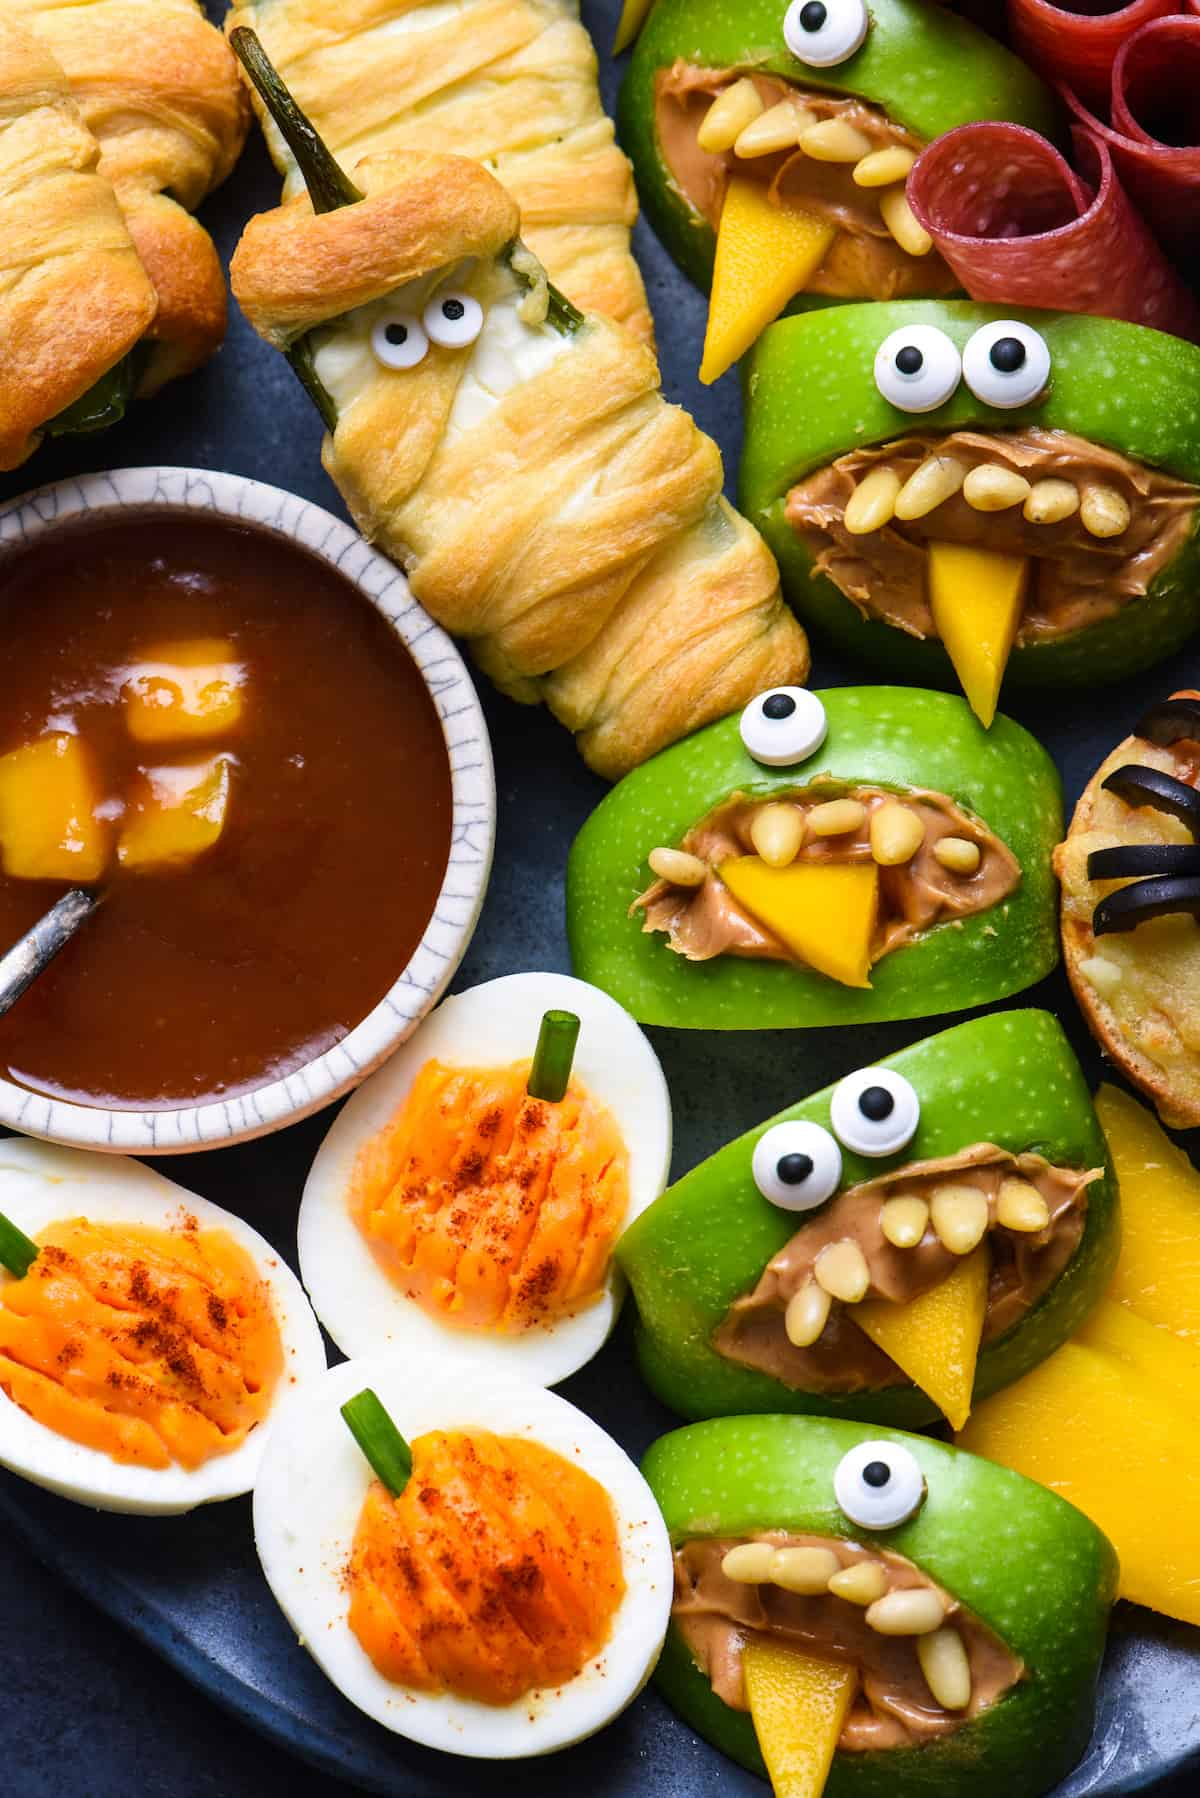 Halloween recipes food network satukisfo halloween recipes food network forumfinder Image collections